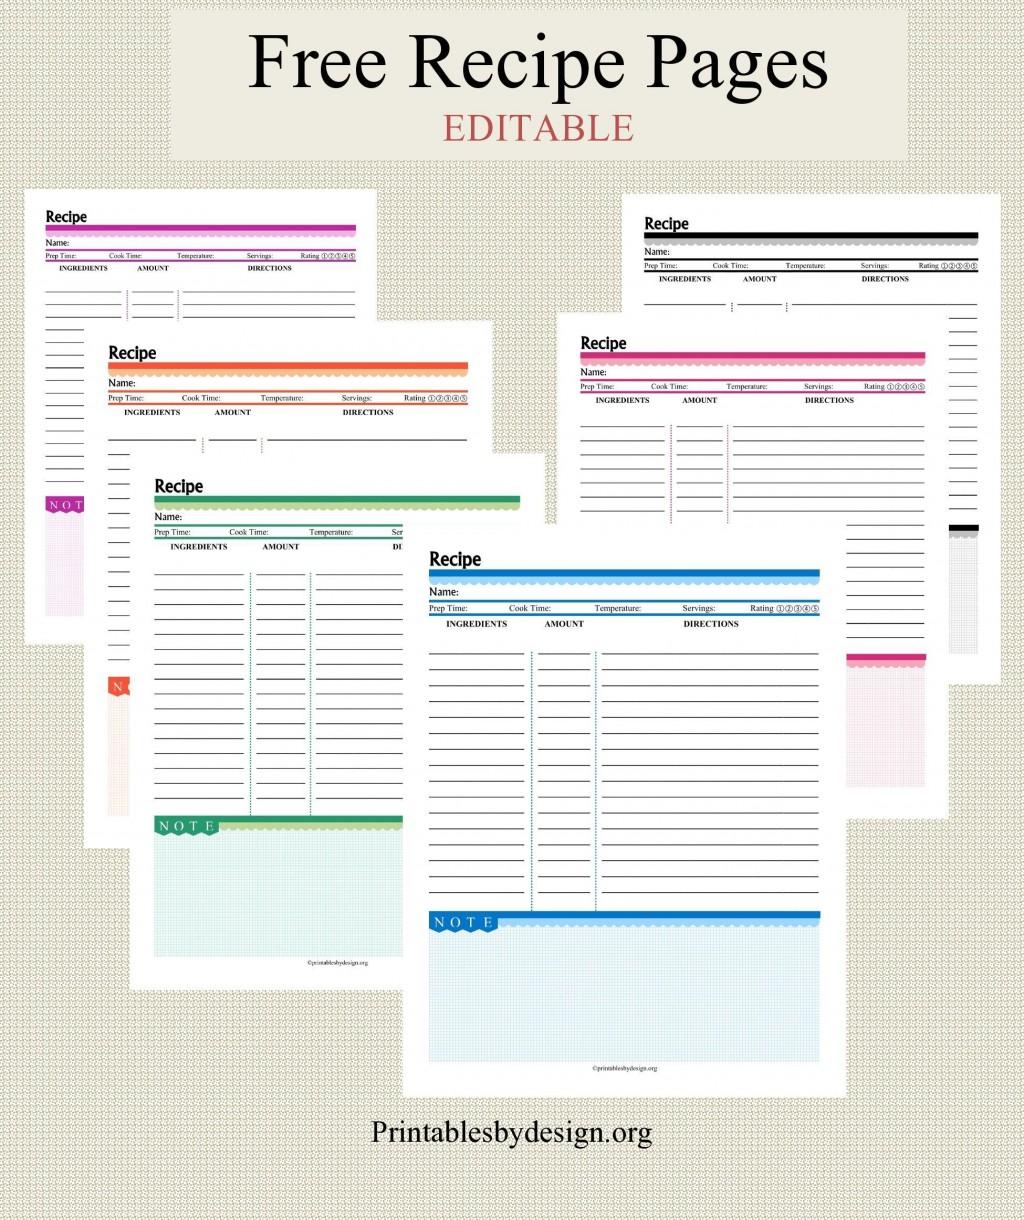 001 Impressive Free Recipe Book Template High Definition  Editable Cookbook For Microsoft Word IndesignLarge